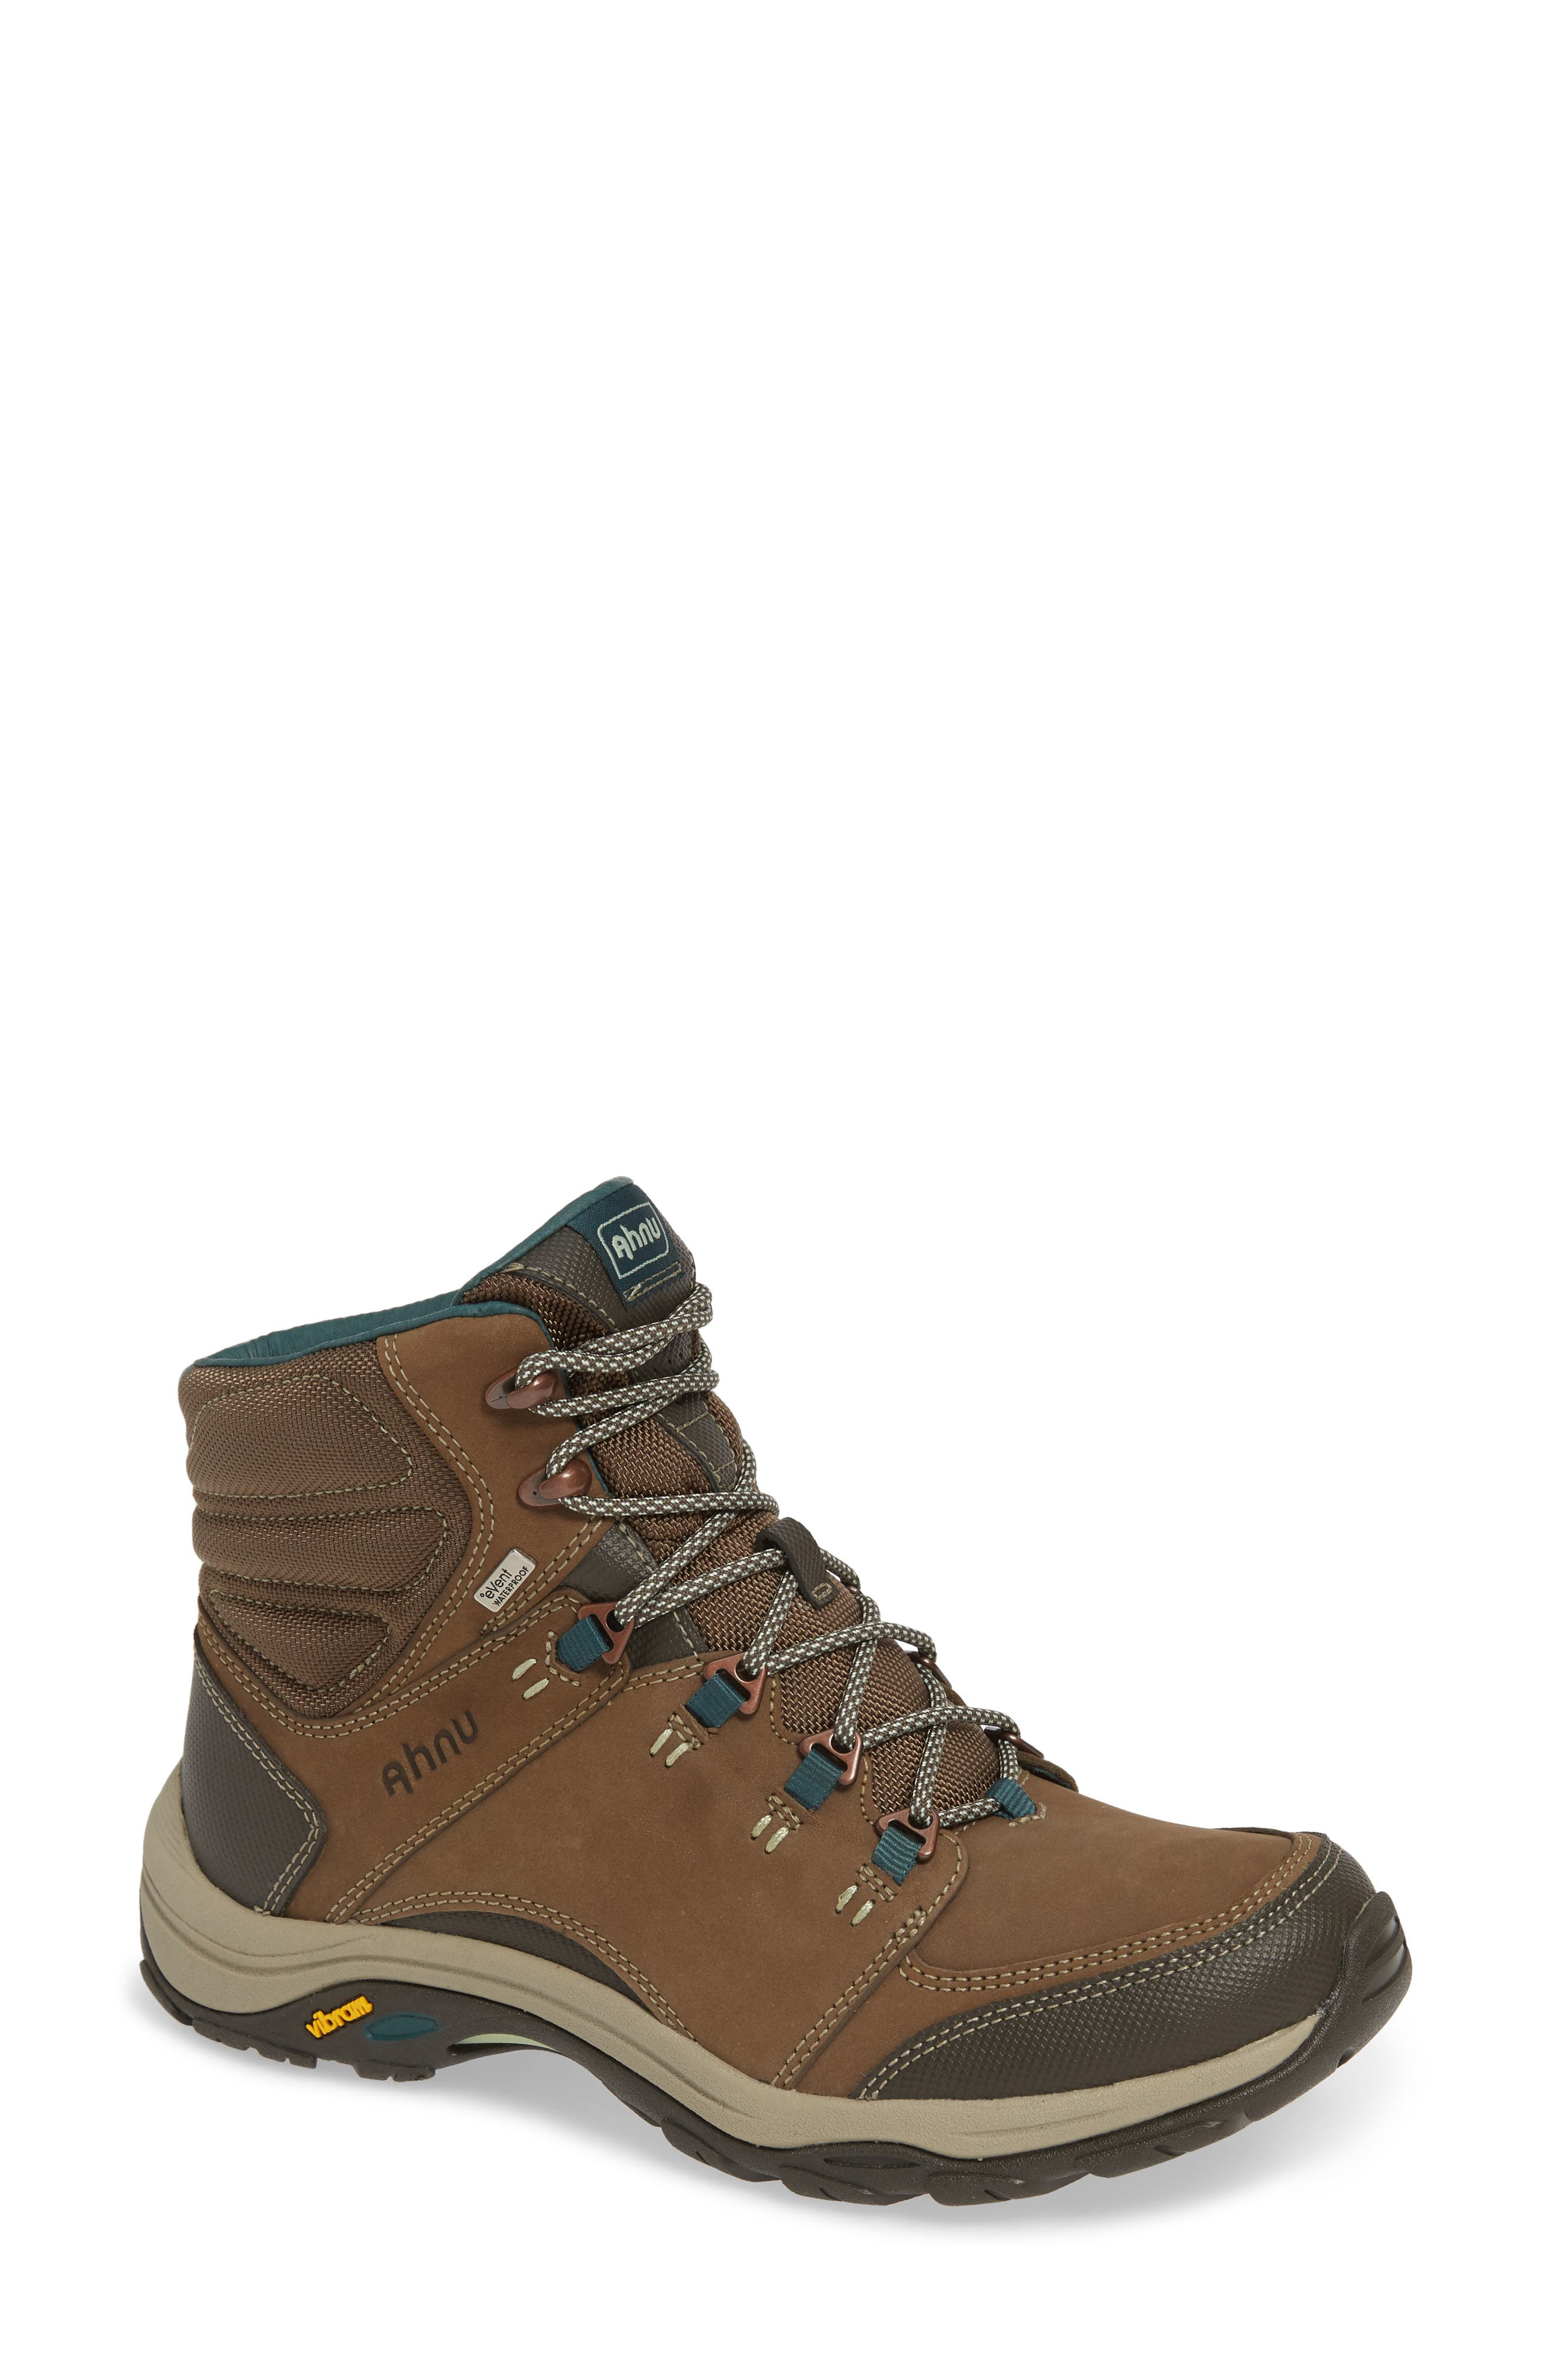 Ahnu by Teva Montara III Waterproof Hiking Boot,                         Main,                         color, CHOCOLATE CHIP NUBUCK LEATHER